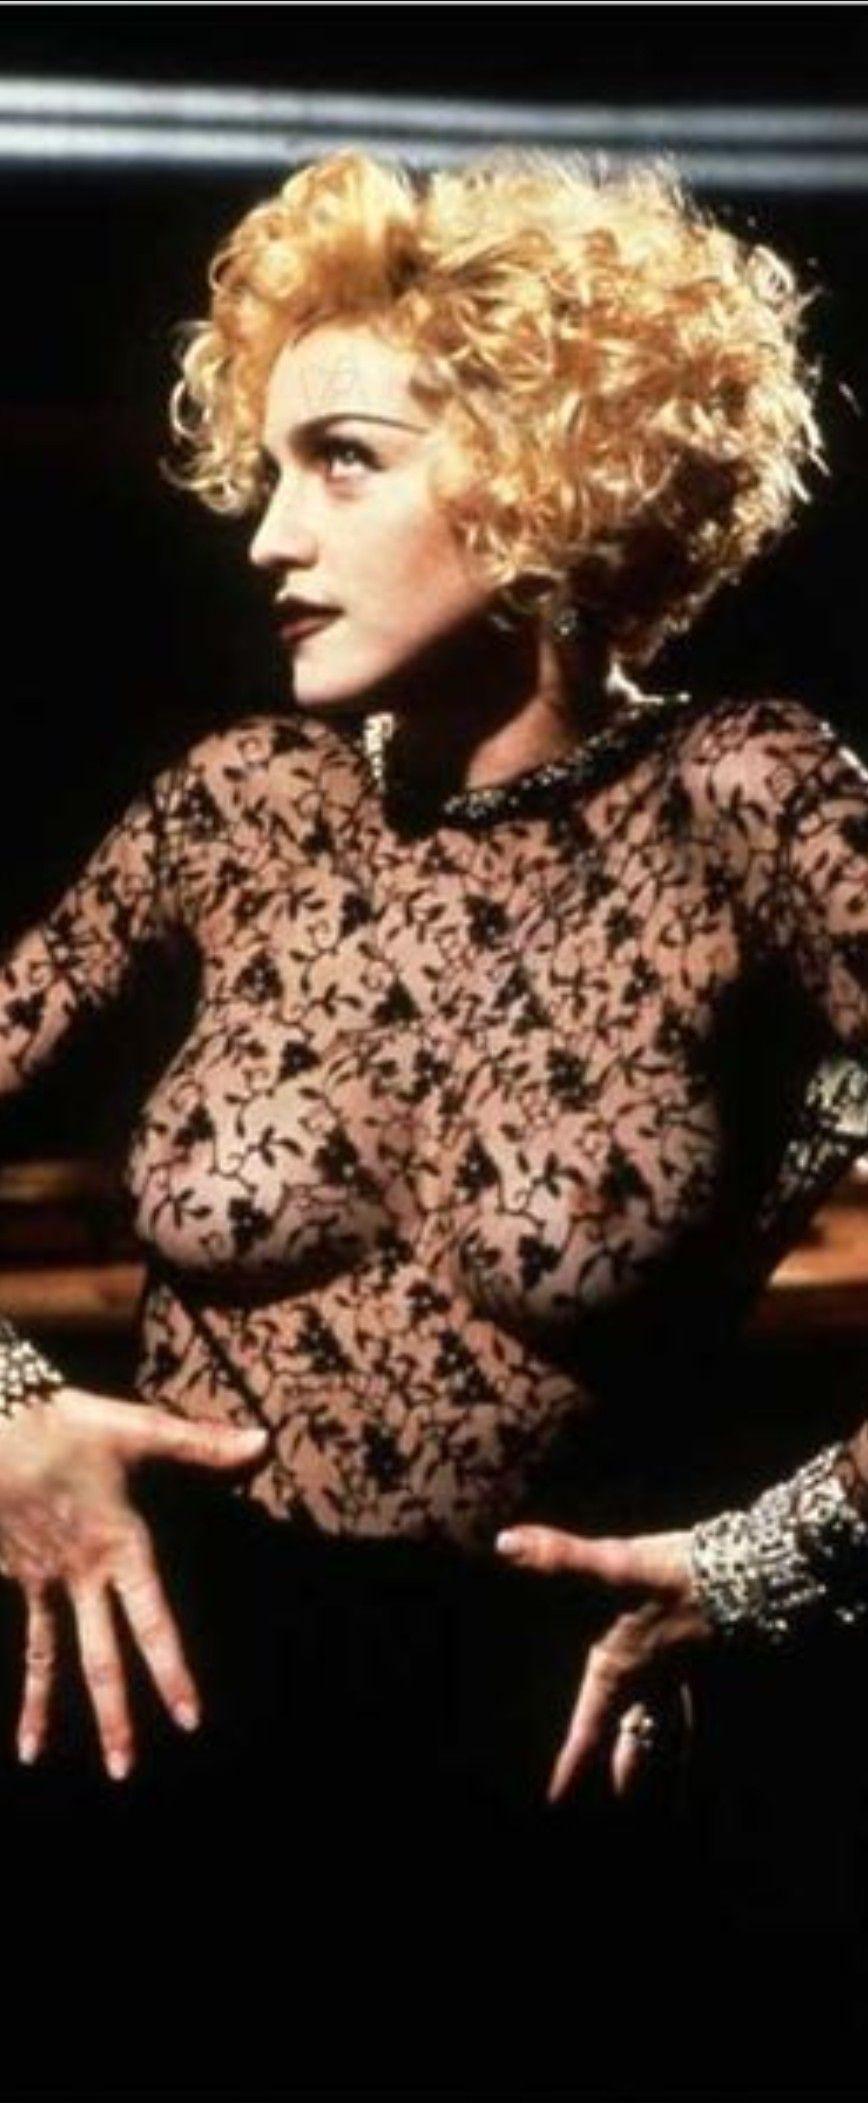 Madonna vogue madonna rock pinterest madonna madonna vogue